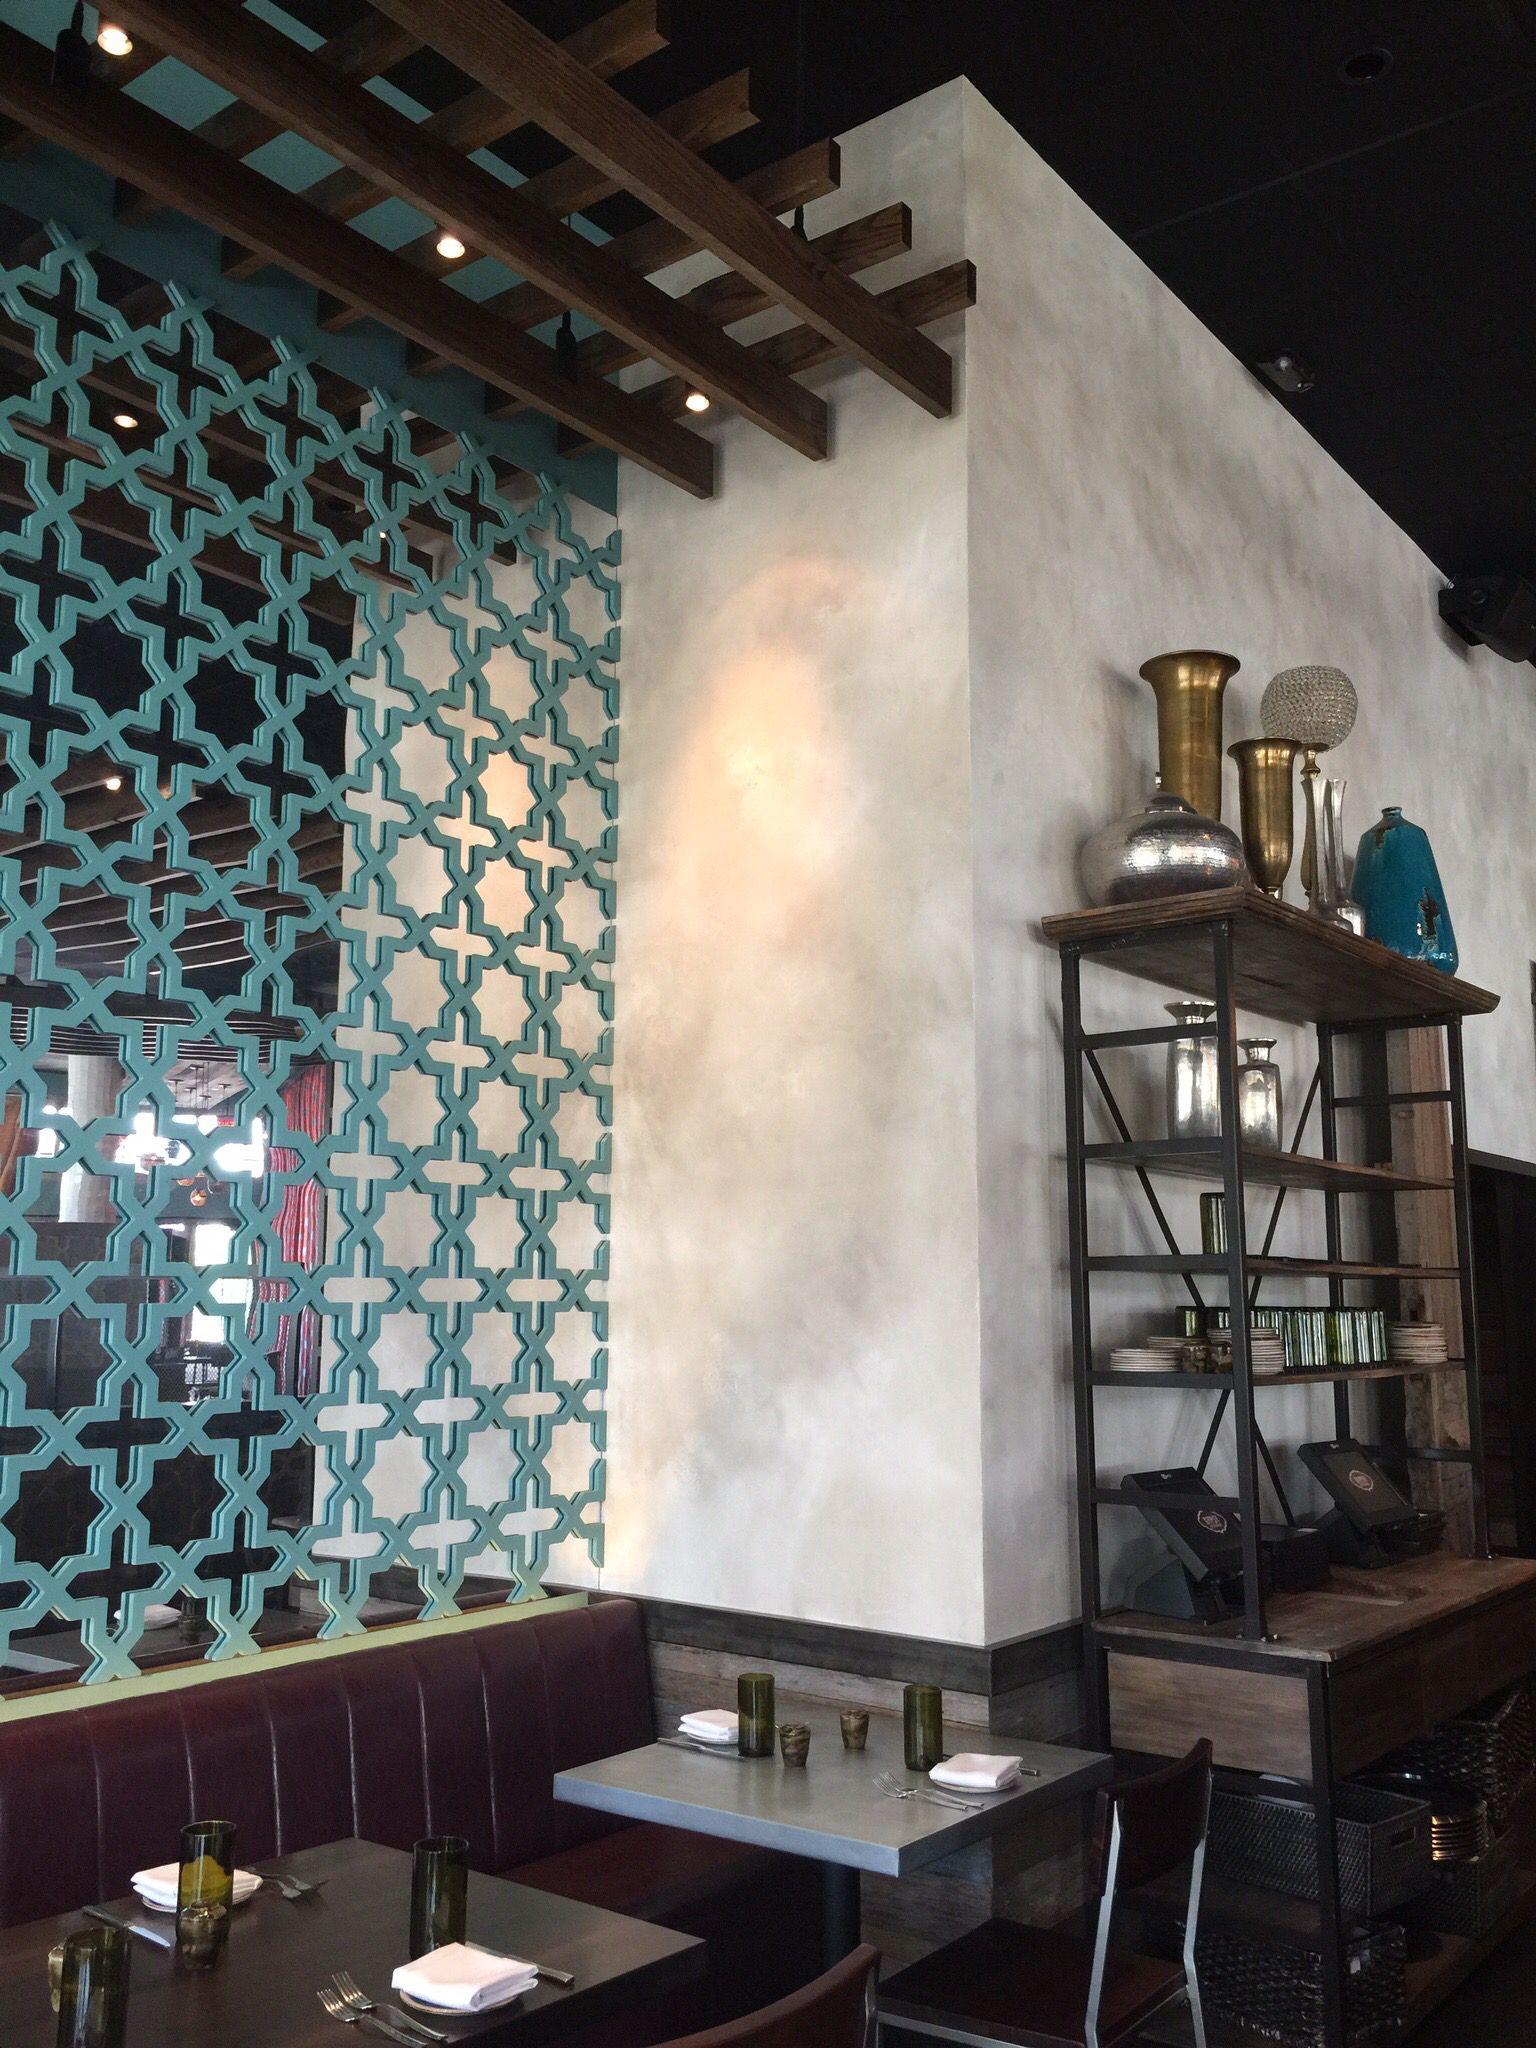 Gypsy Kitchen, Atlanta, GA. Lime Italian Plaster Walls By Struttura.  Www.struttura.us